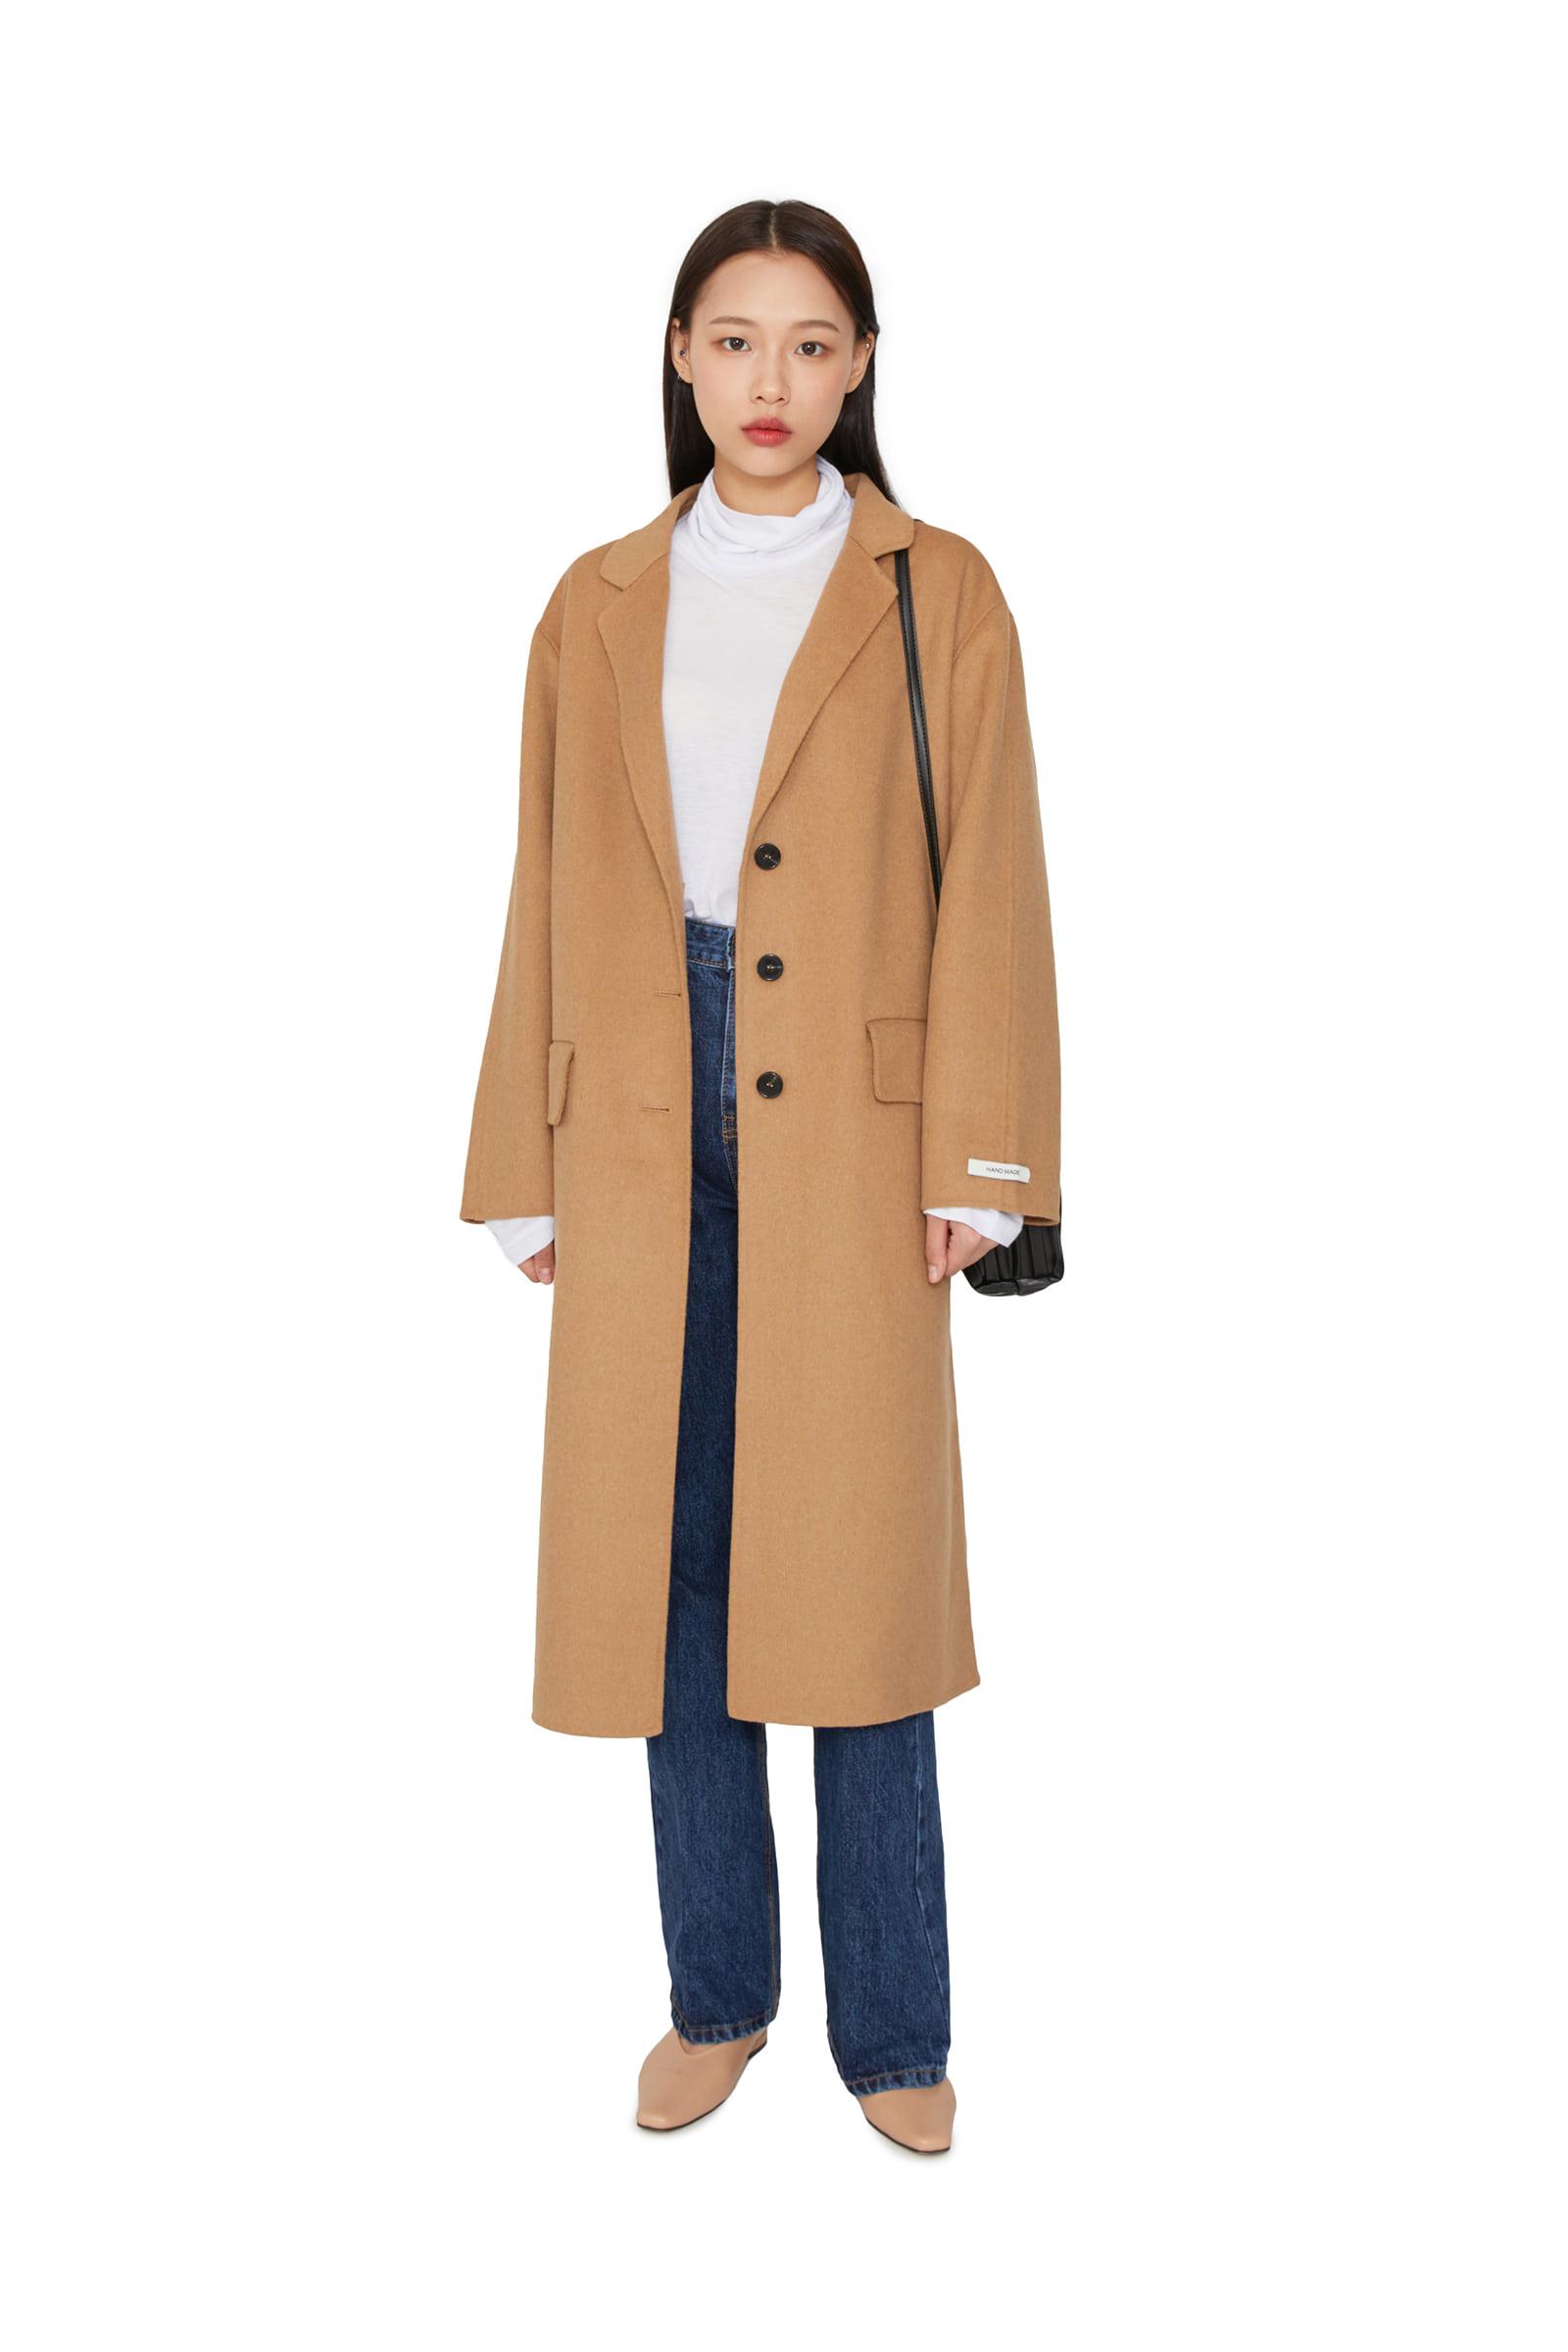 Planning wool single handmade coat